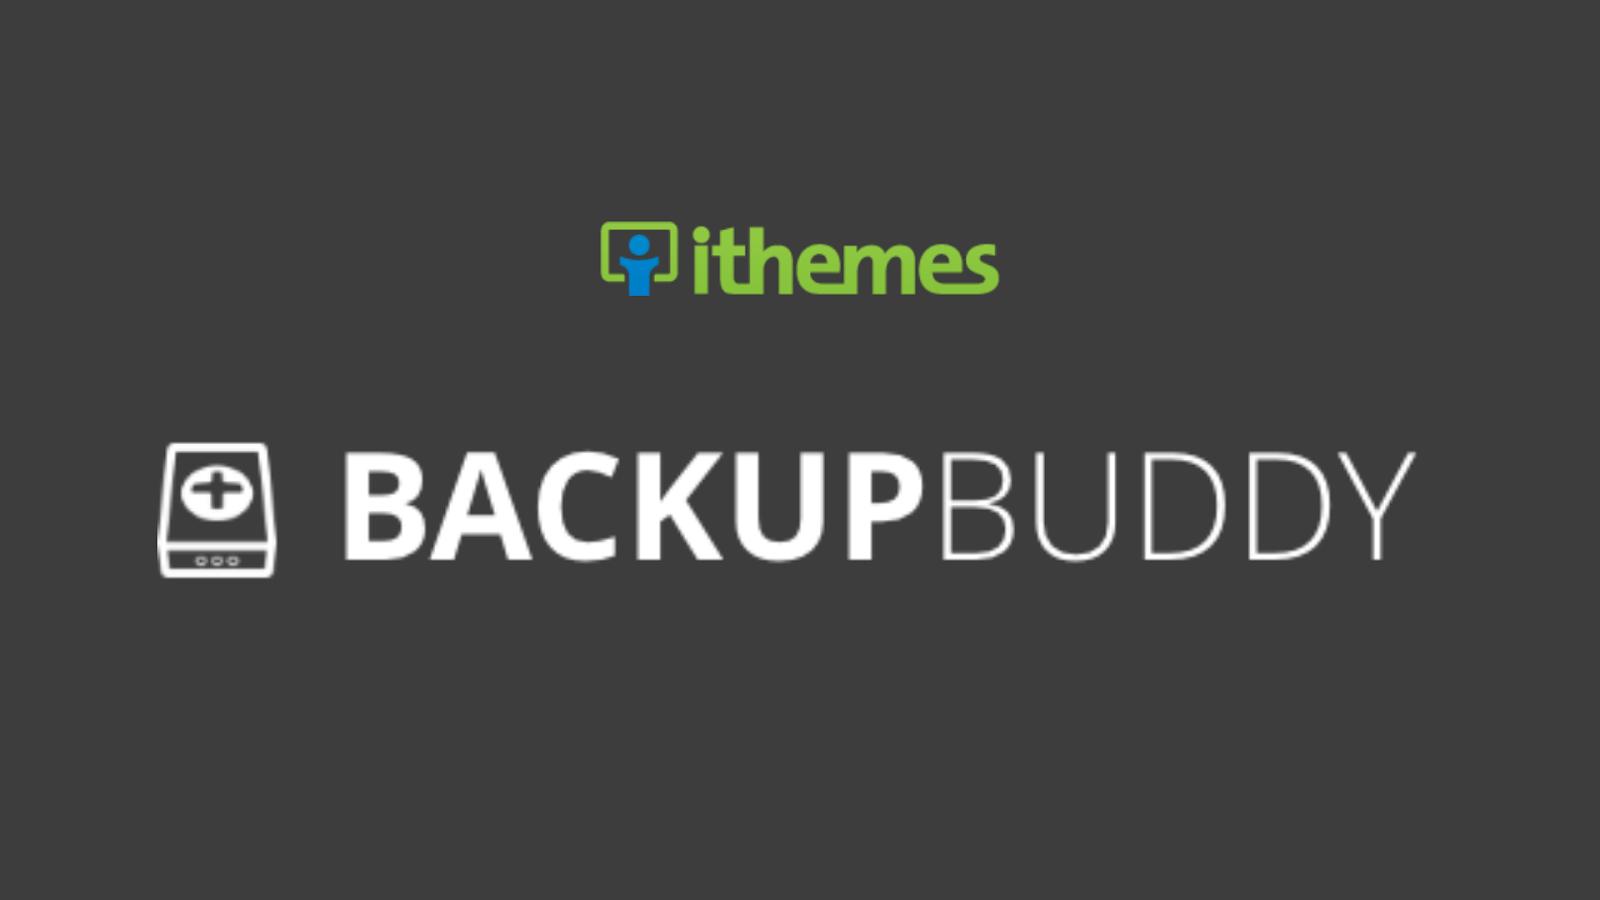 Backup buddy - wordpress migration plugins